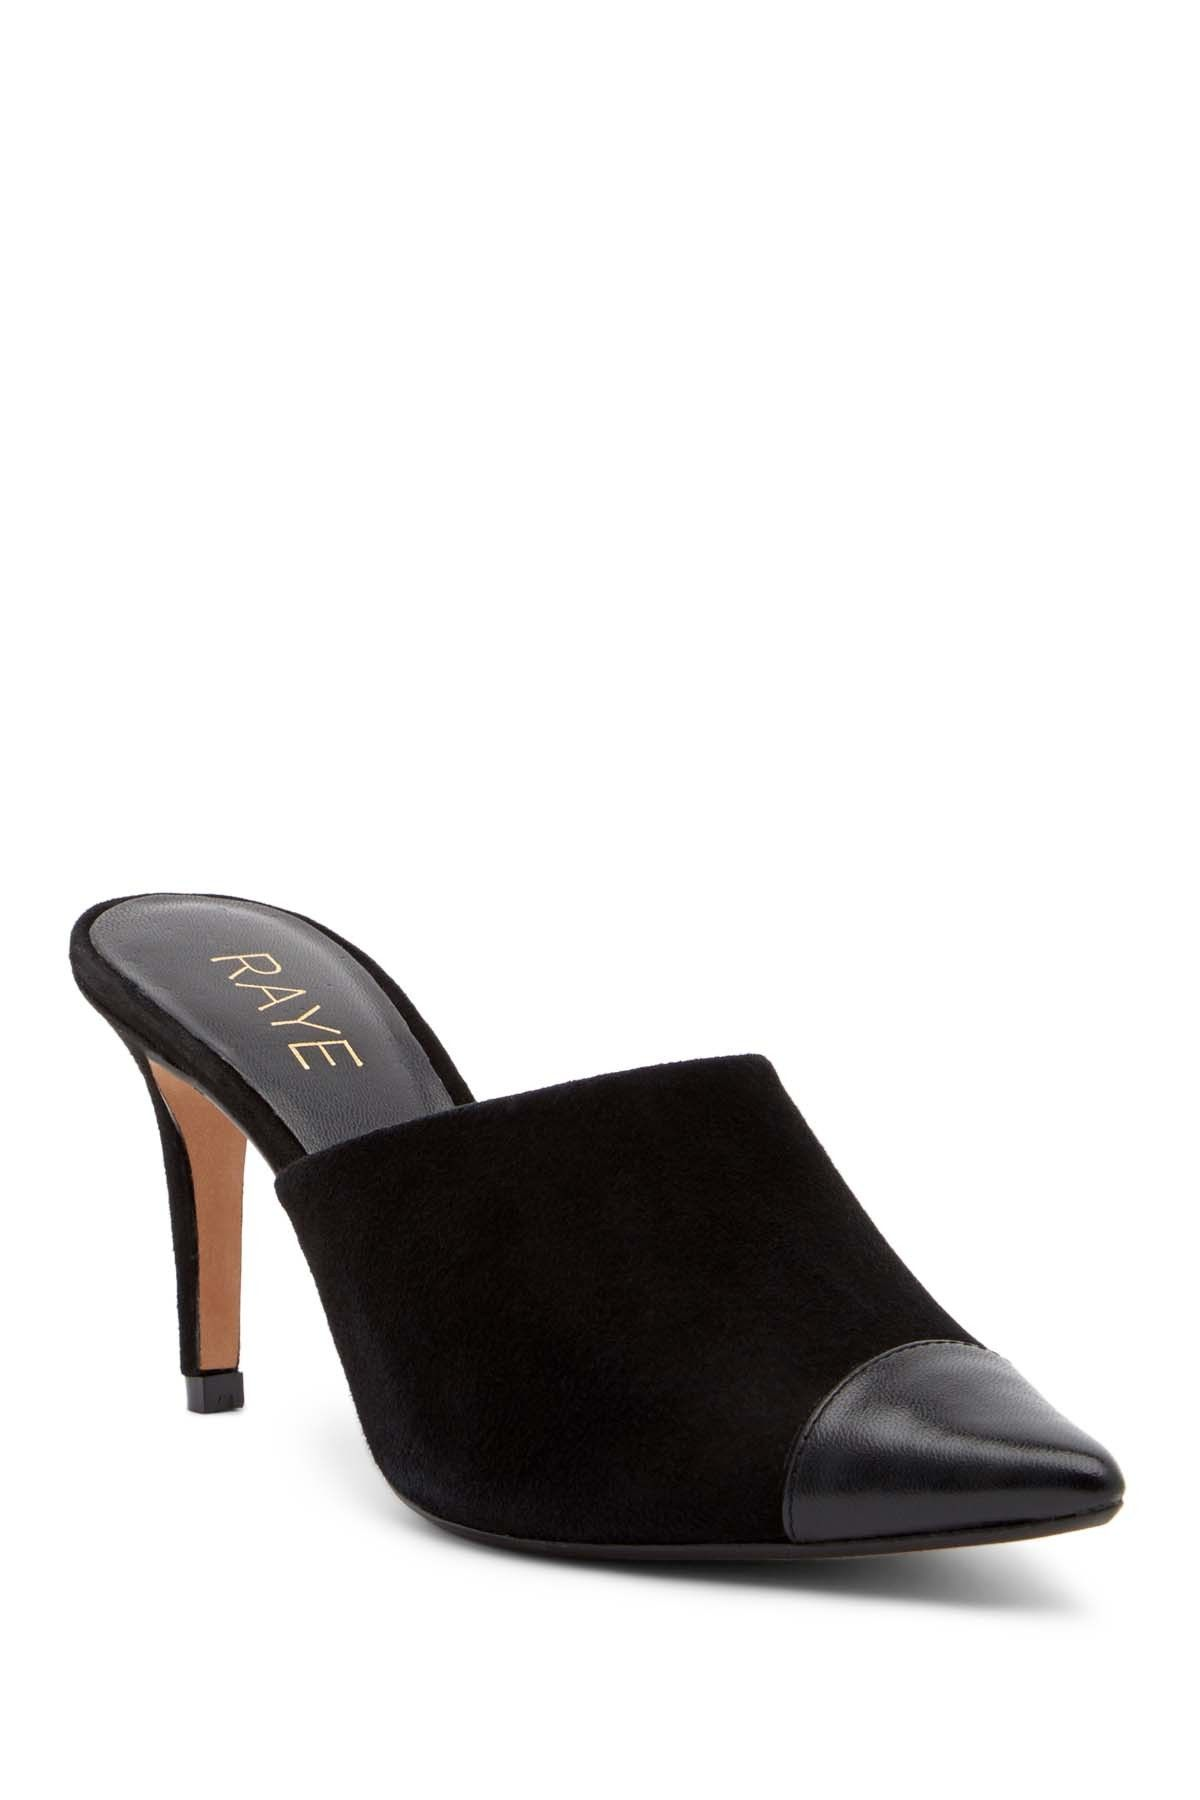 67cc08690ca Raye Phoebe Leather Mule